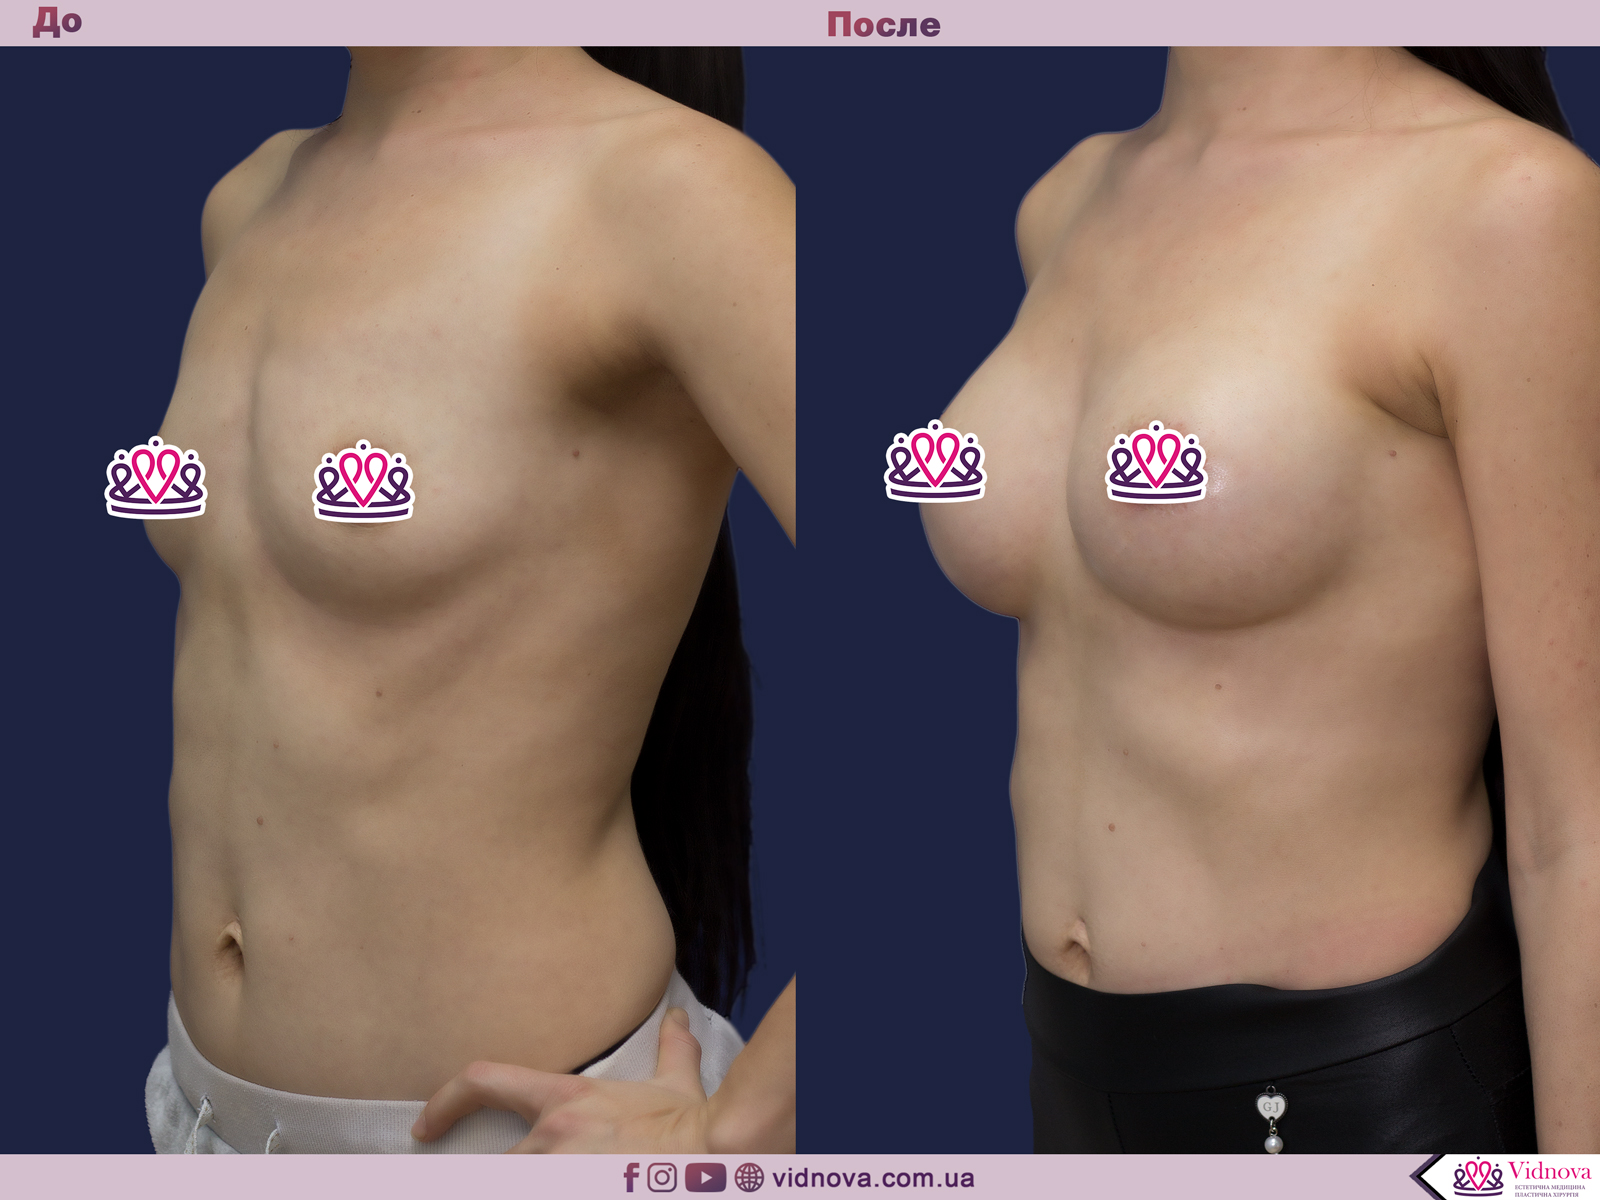 Увеличение груди: Фото ДО и ПОСЛЕ - Пример №73-2 - Клиника Vidnova